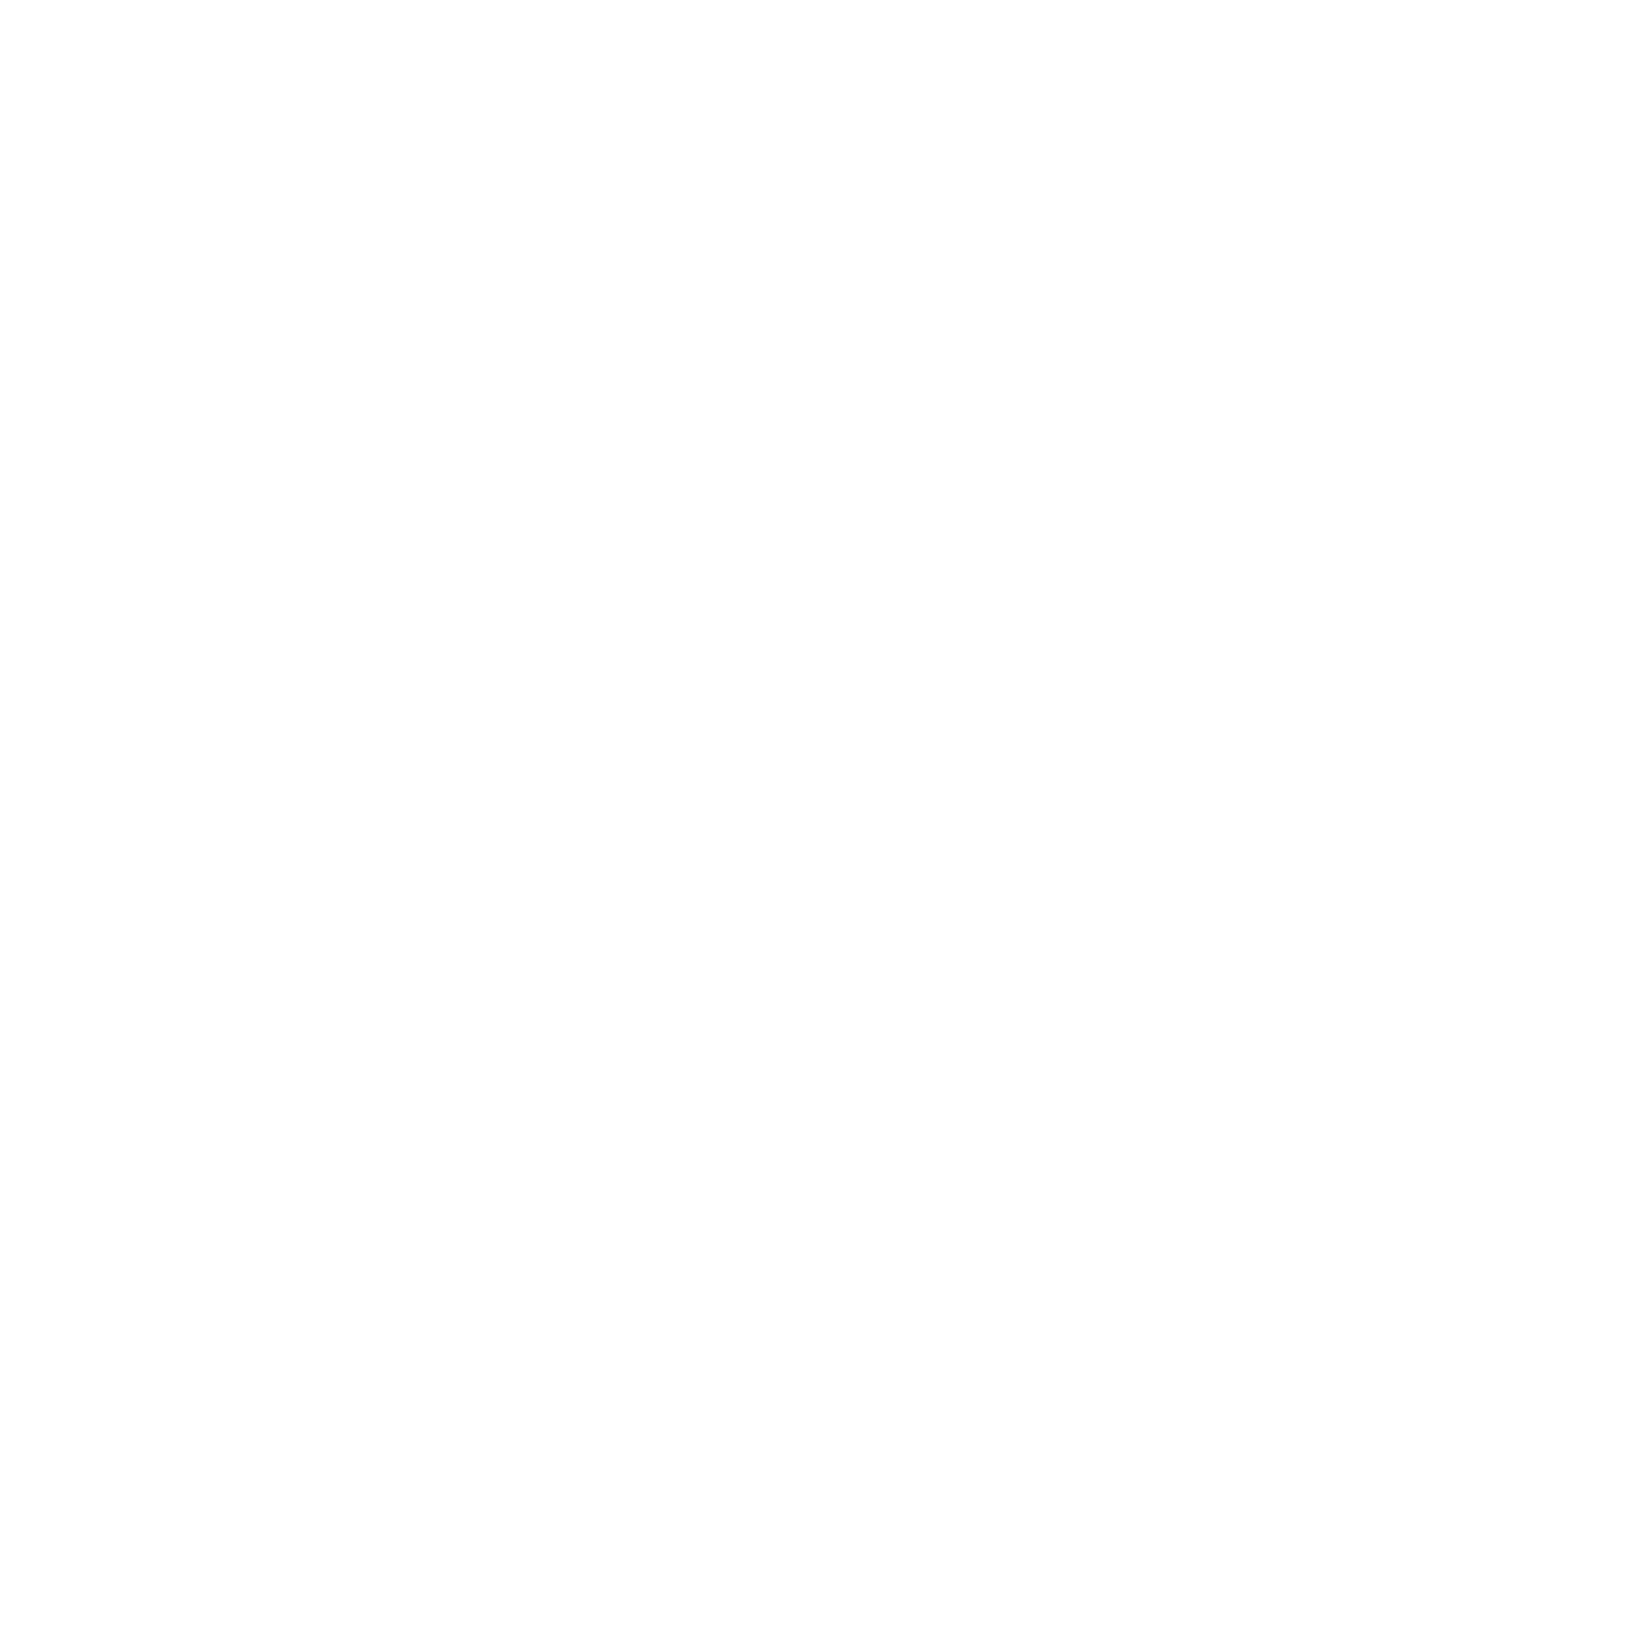 Rockland Park Untitled-2